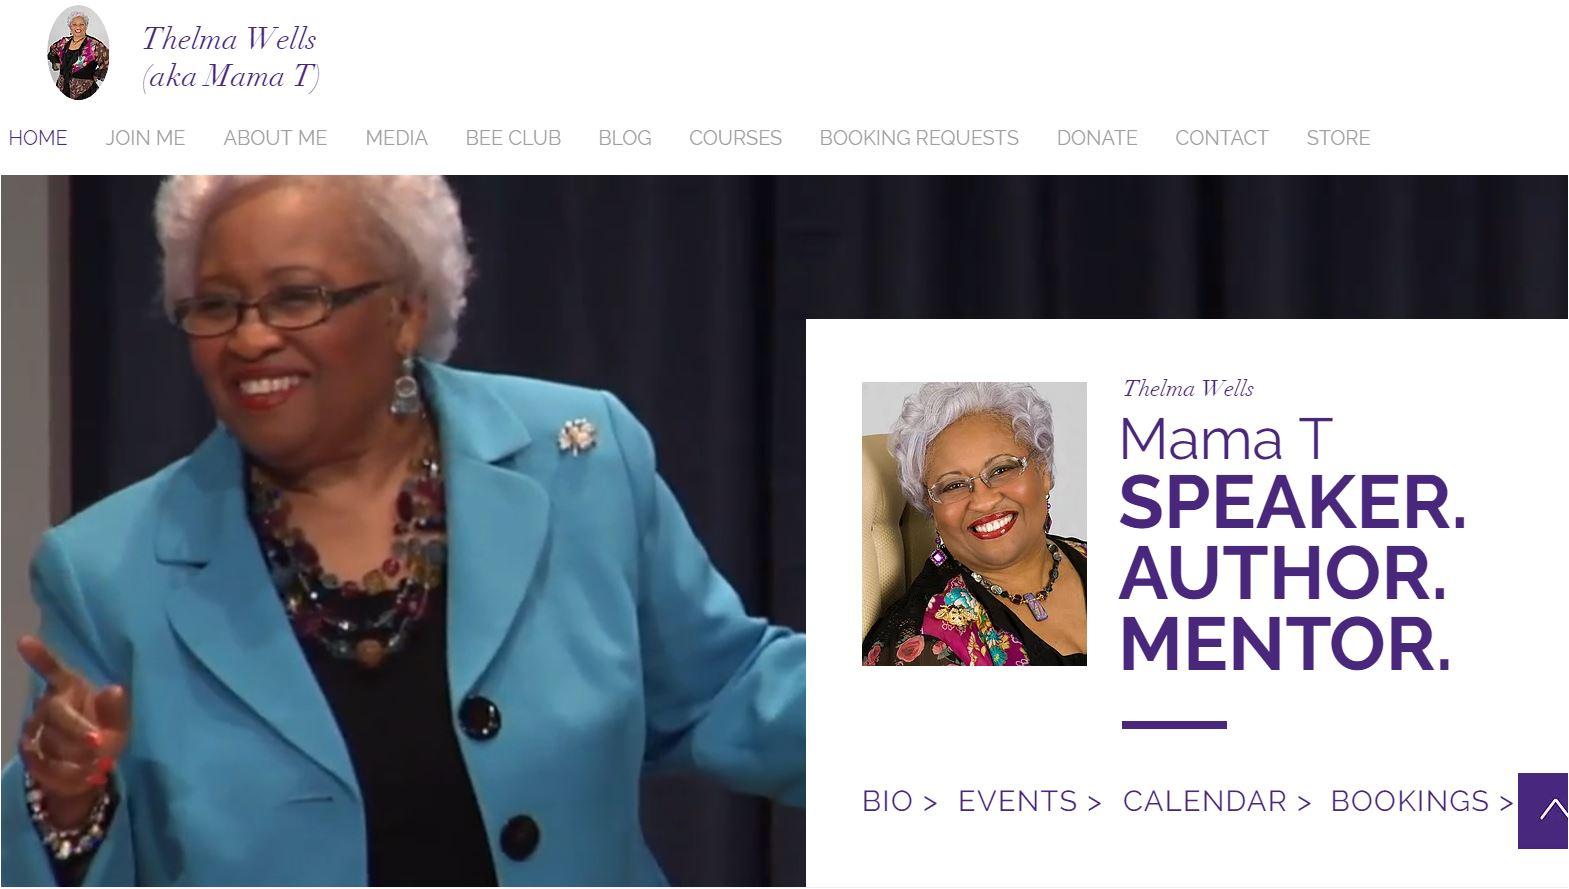 thelma wells website.JPG